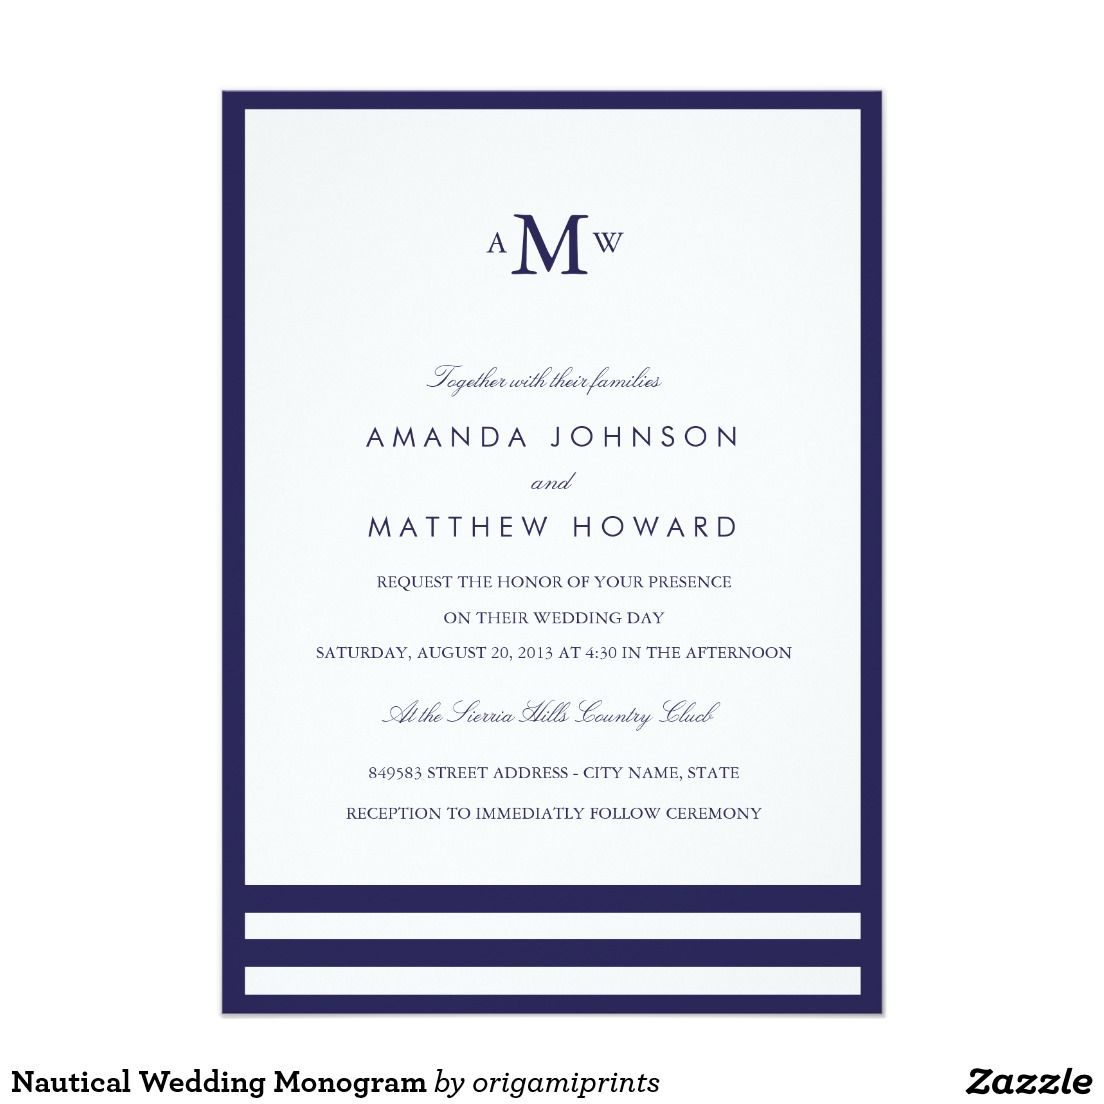 Nautical Wedding Monogram Card Wedding Monograms Nautical Wedding